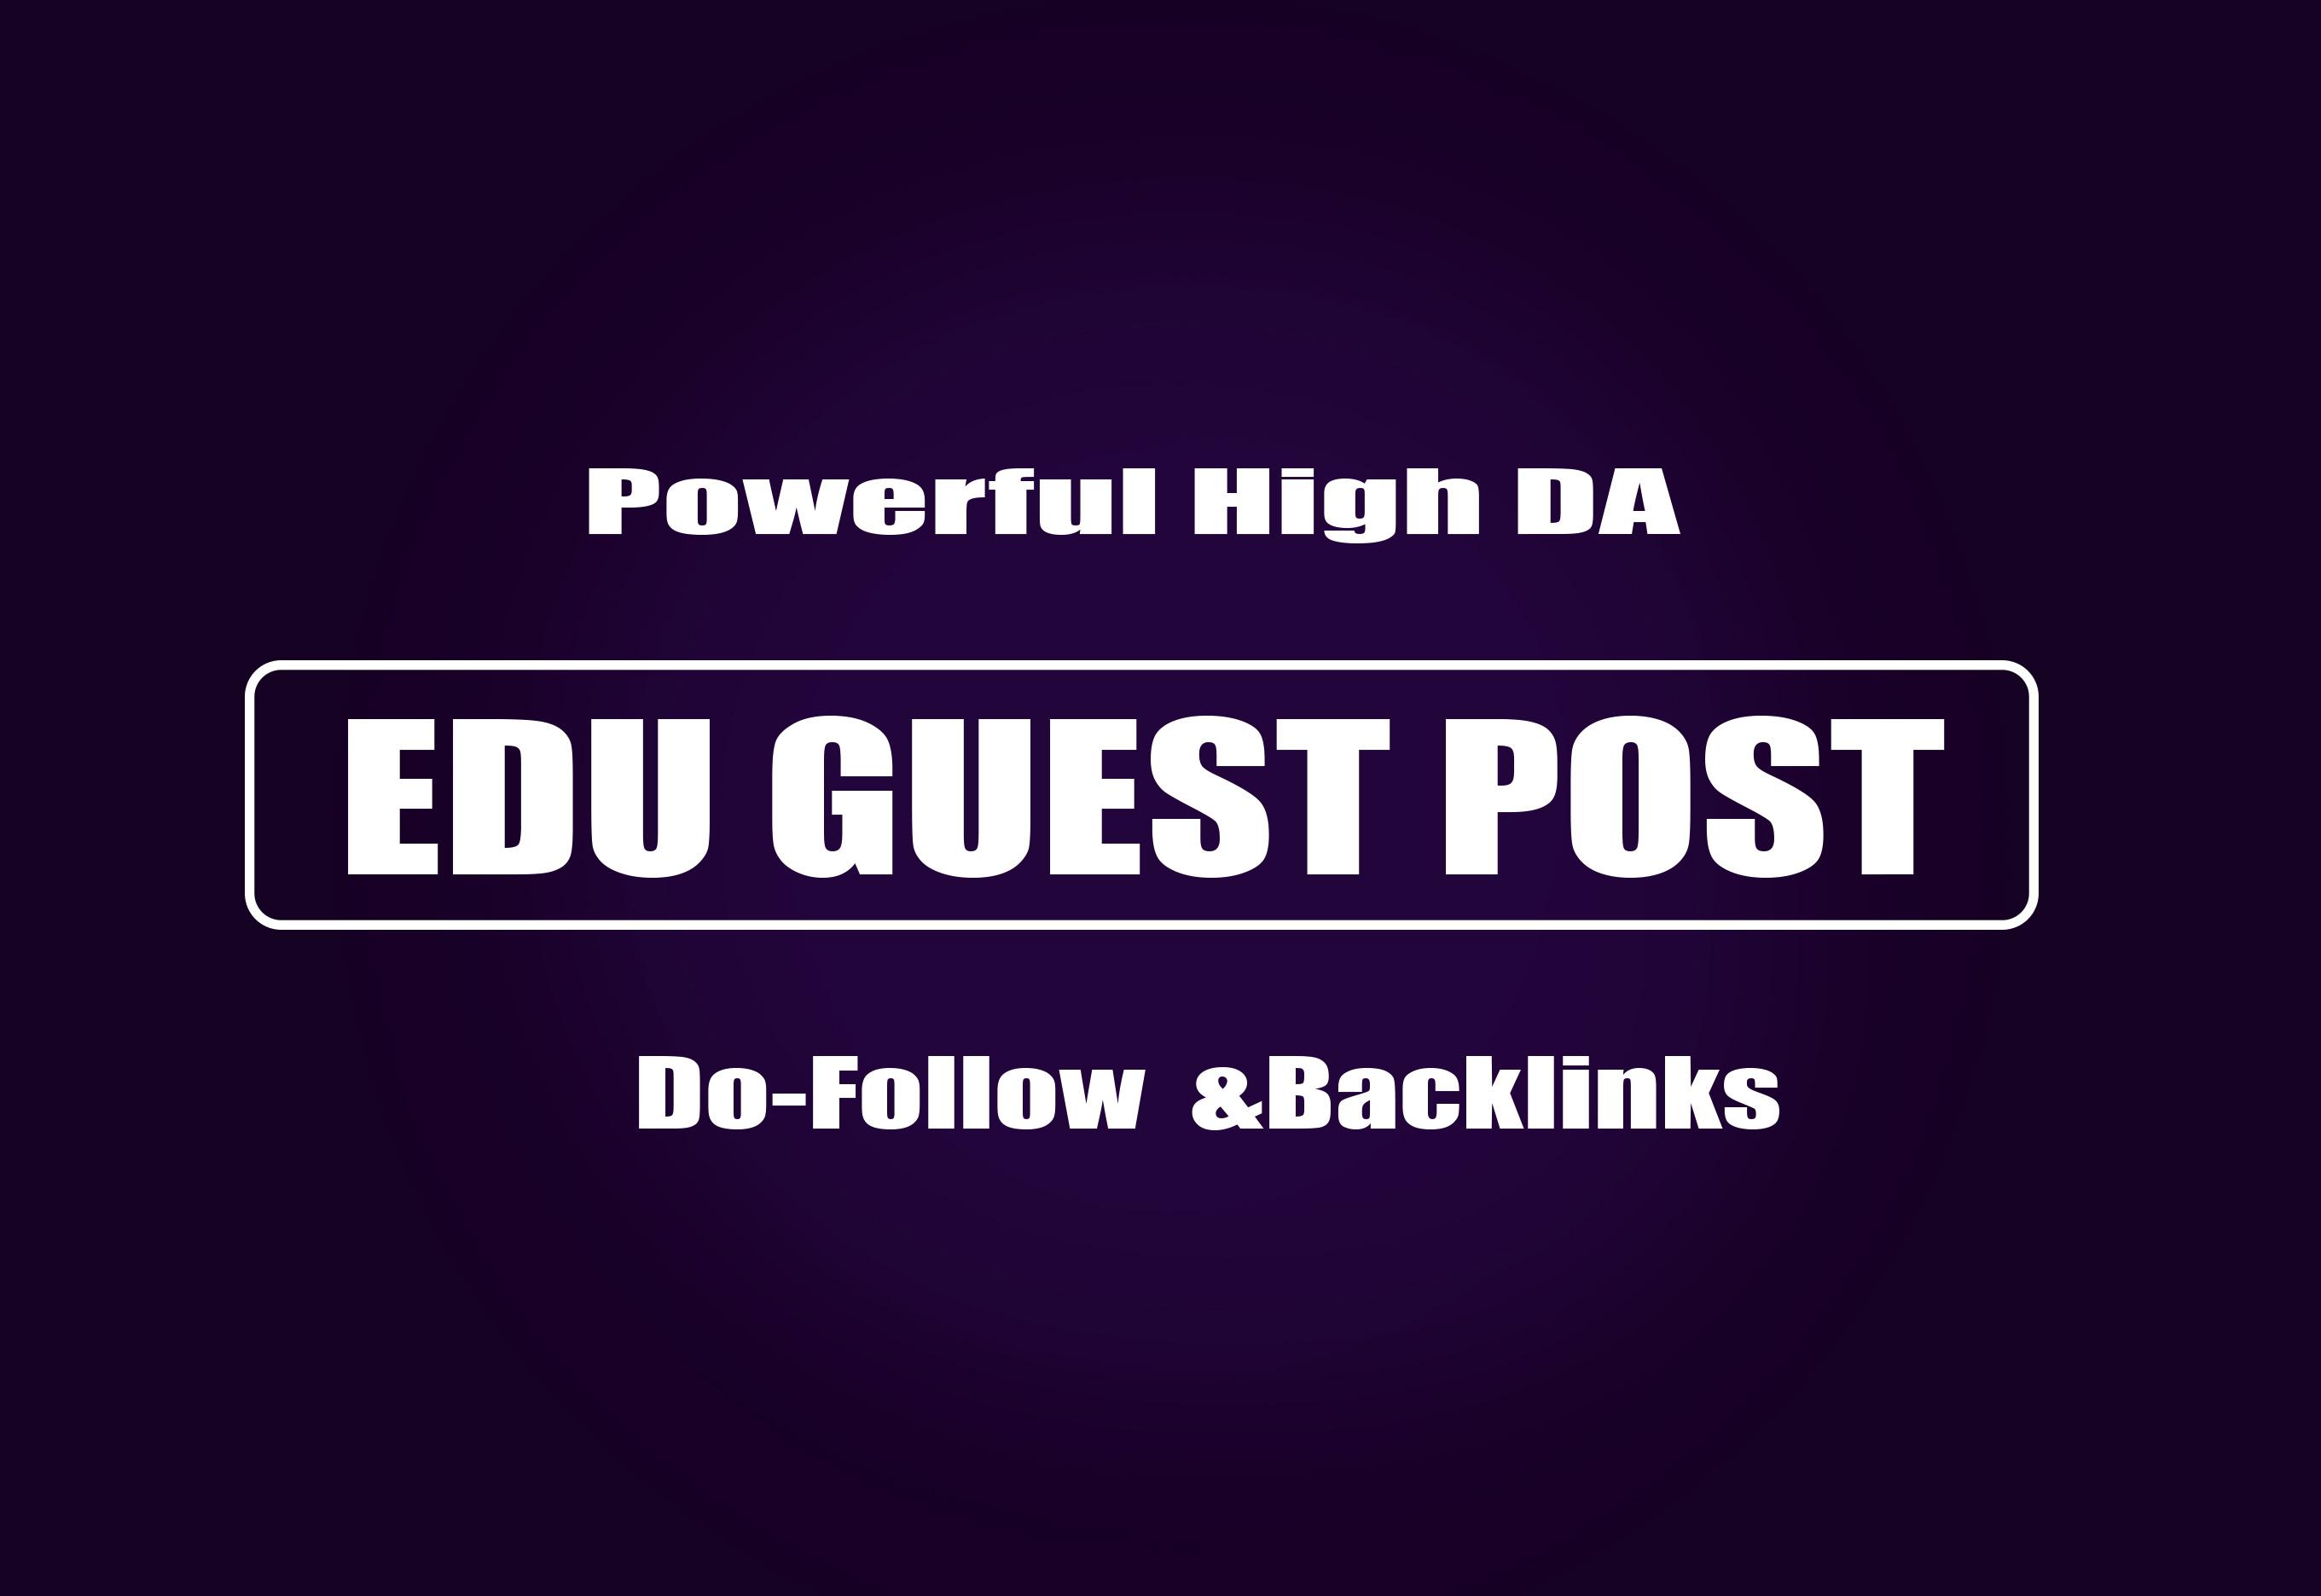 publish 5 EDU Guest Posts on High DA websites